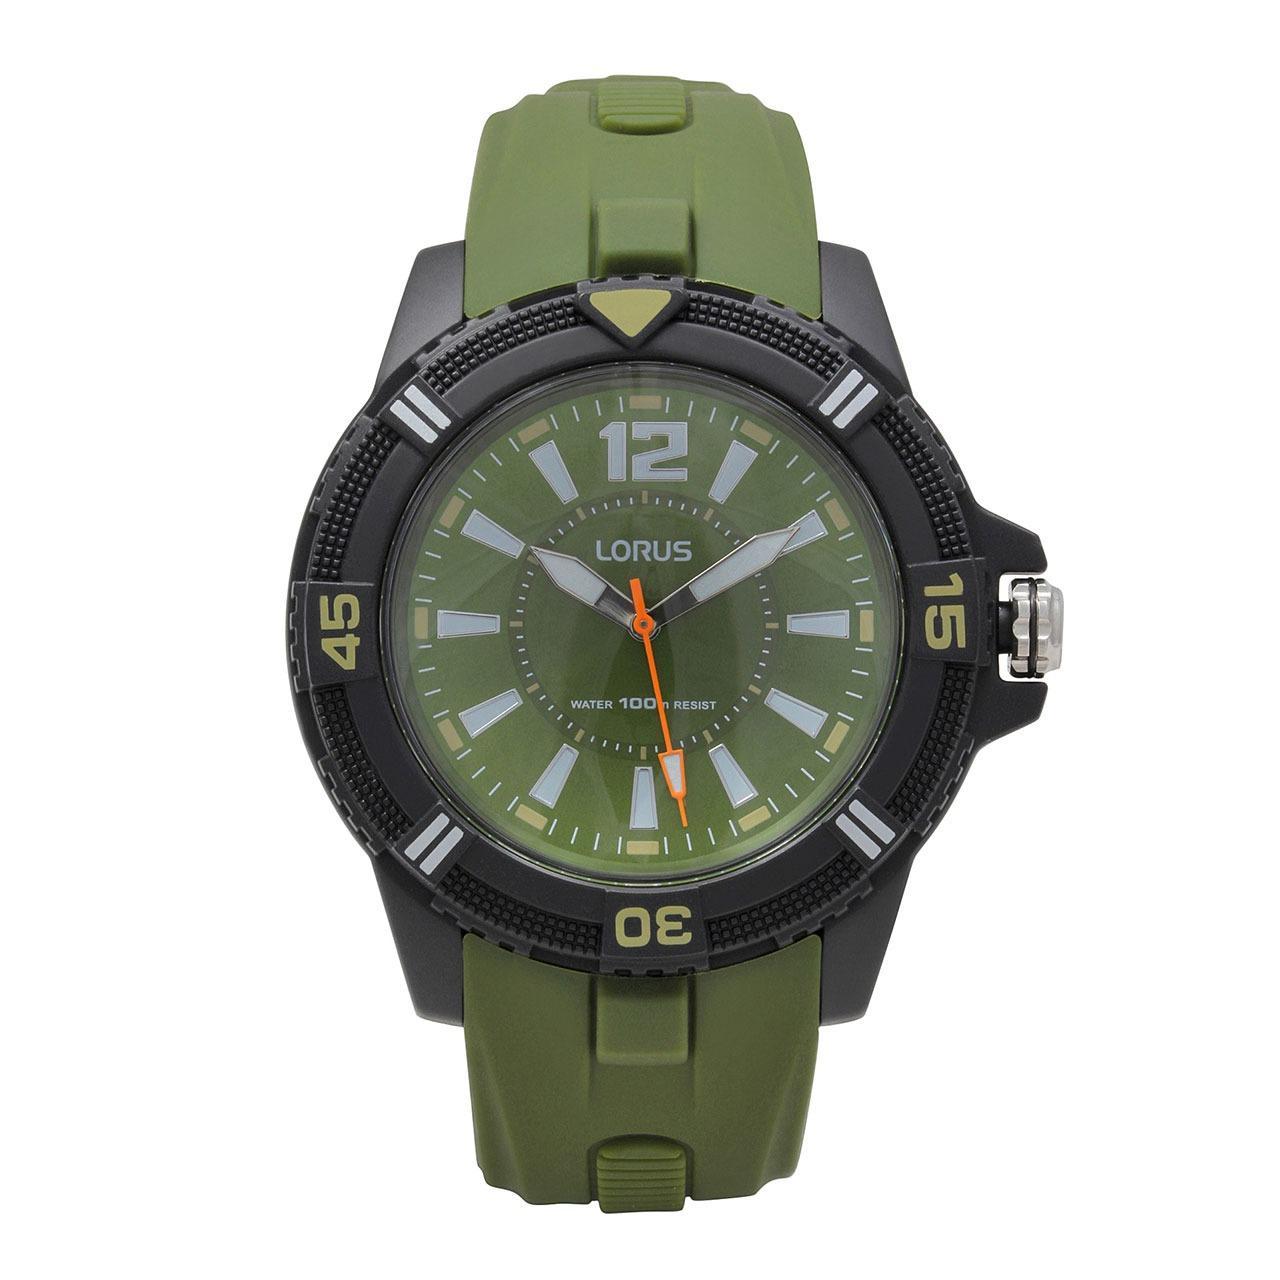 LORUS Jam Tangan - Green Black - Silicon - RRX13FX9